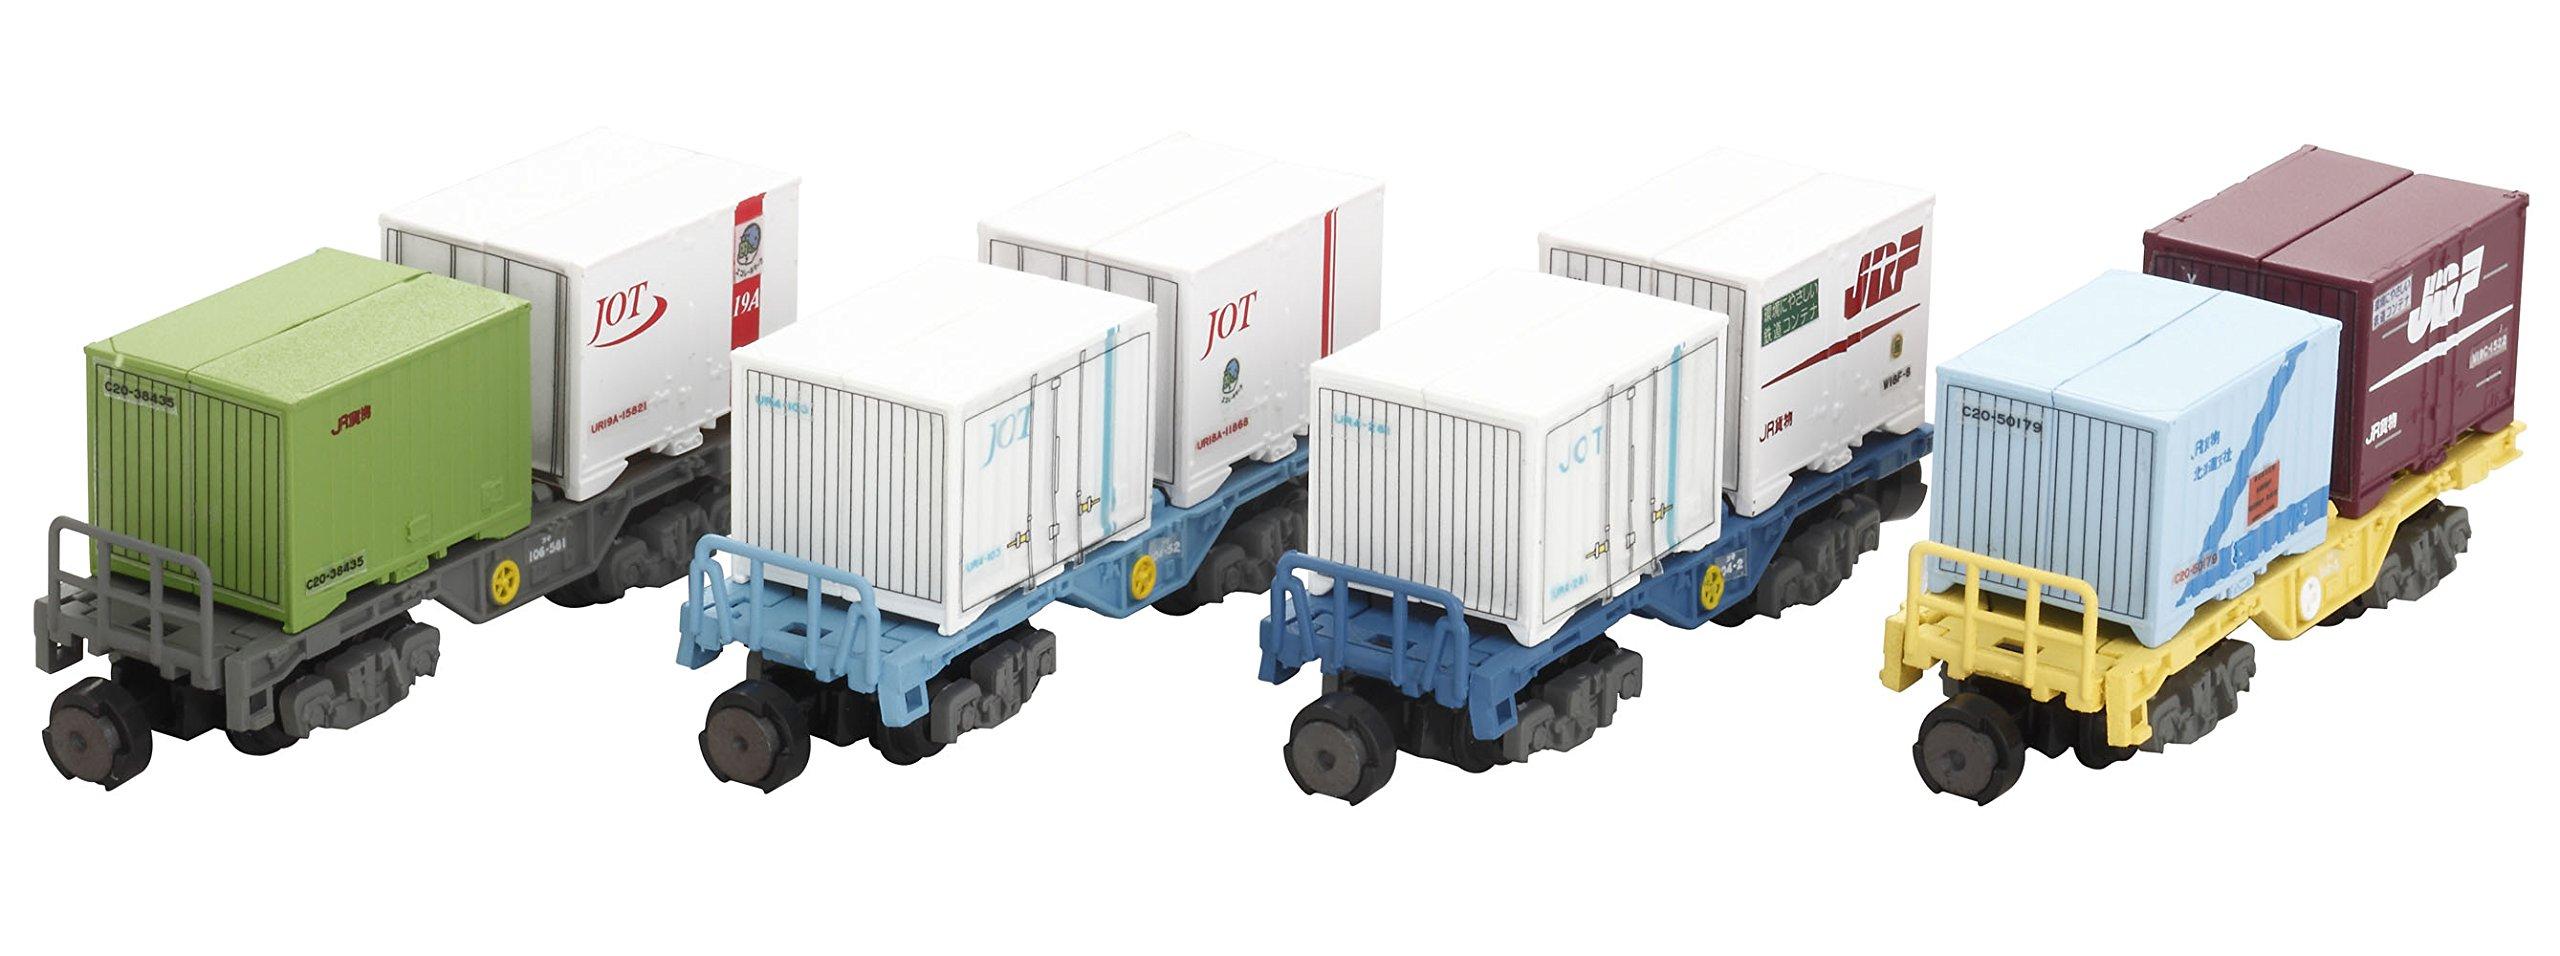 Set 3-series wagon Handjob 100 B Train Shorty Container [Japan Import] [Toy] (japan import)